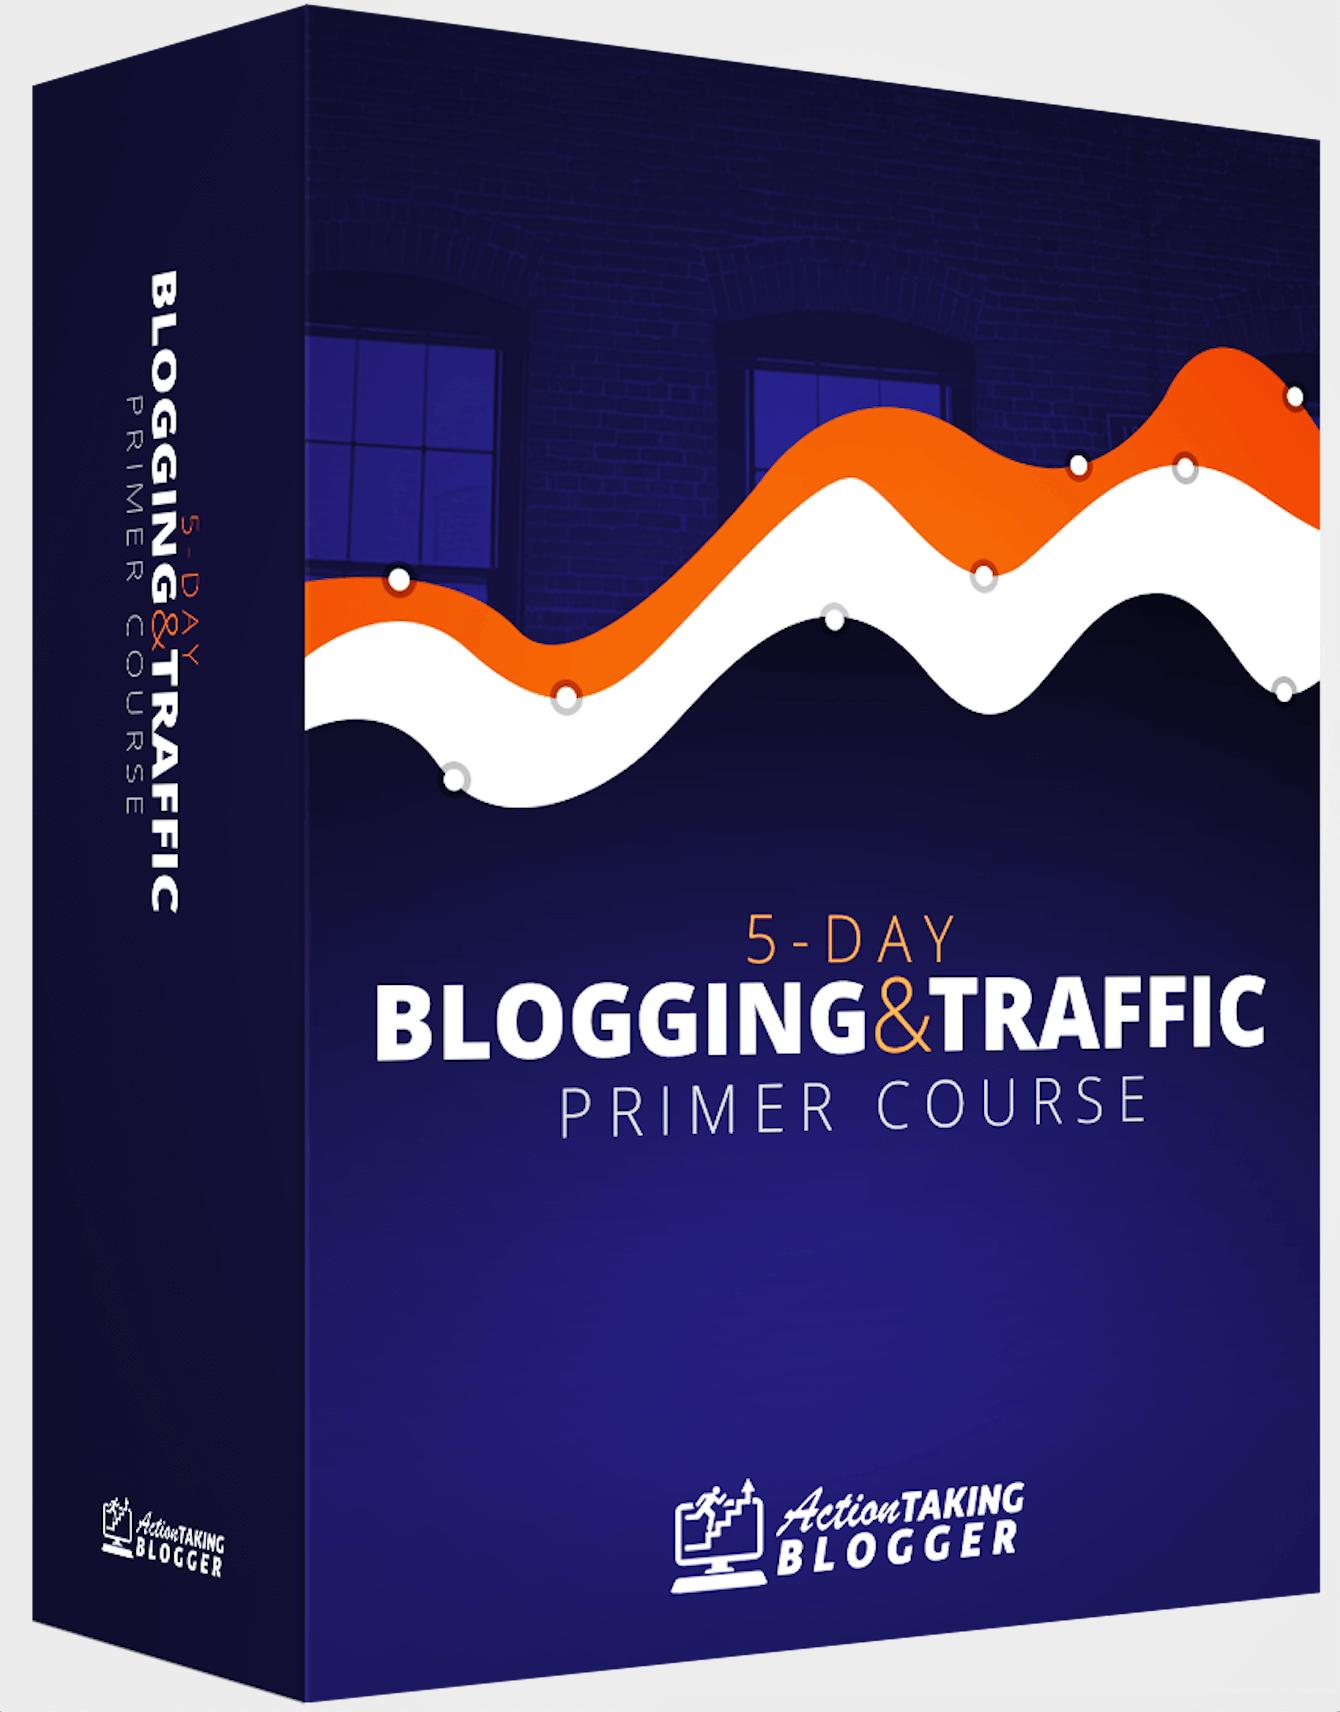 Blogging and Traffic Primer